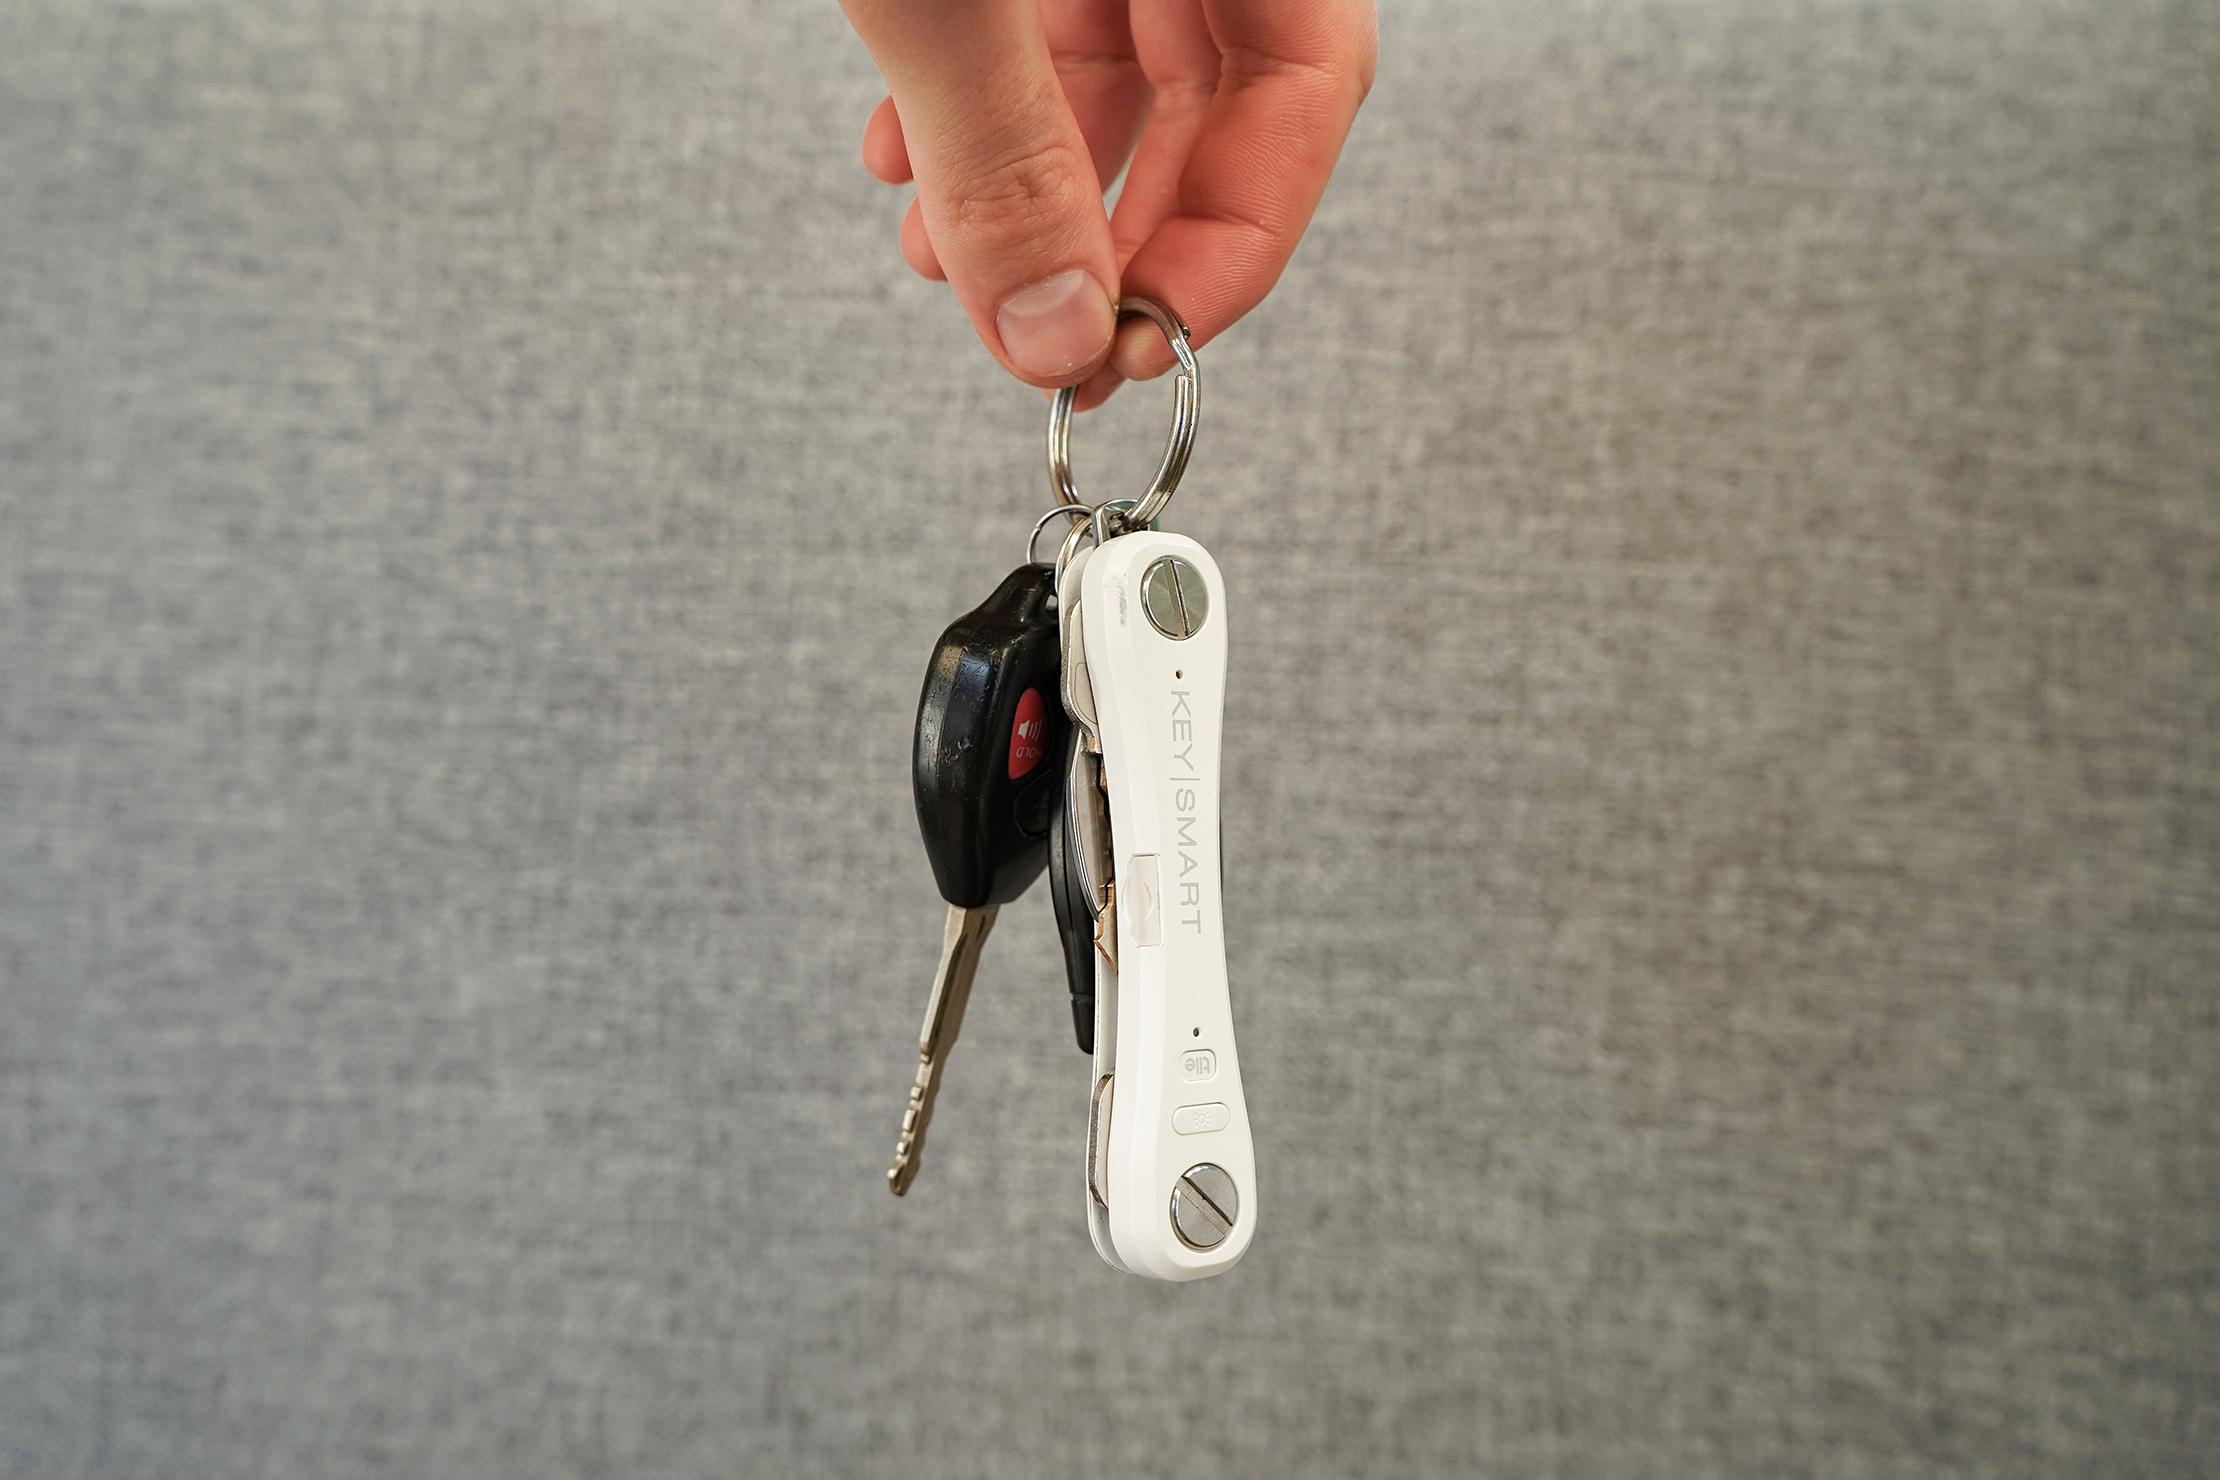 KeySmart Key Organizer Pro On A Keychain